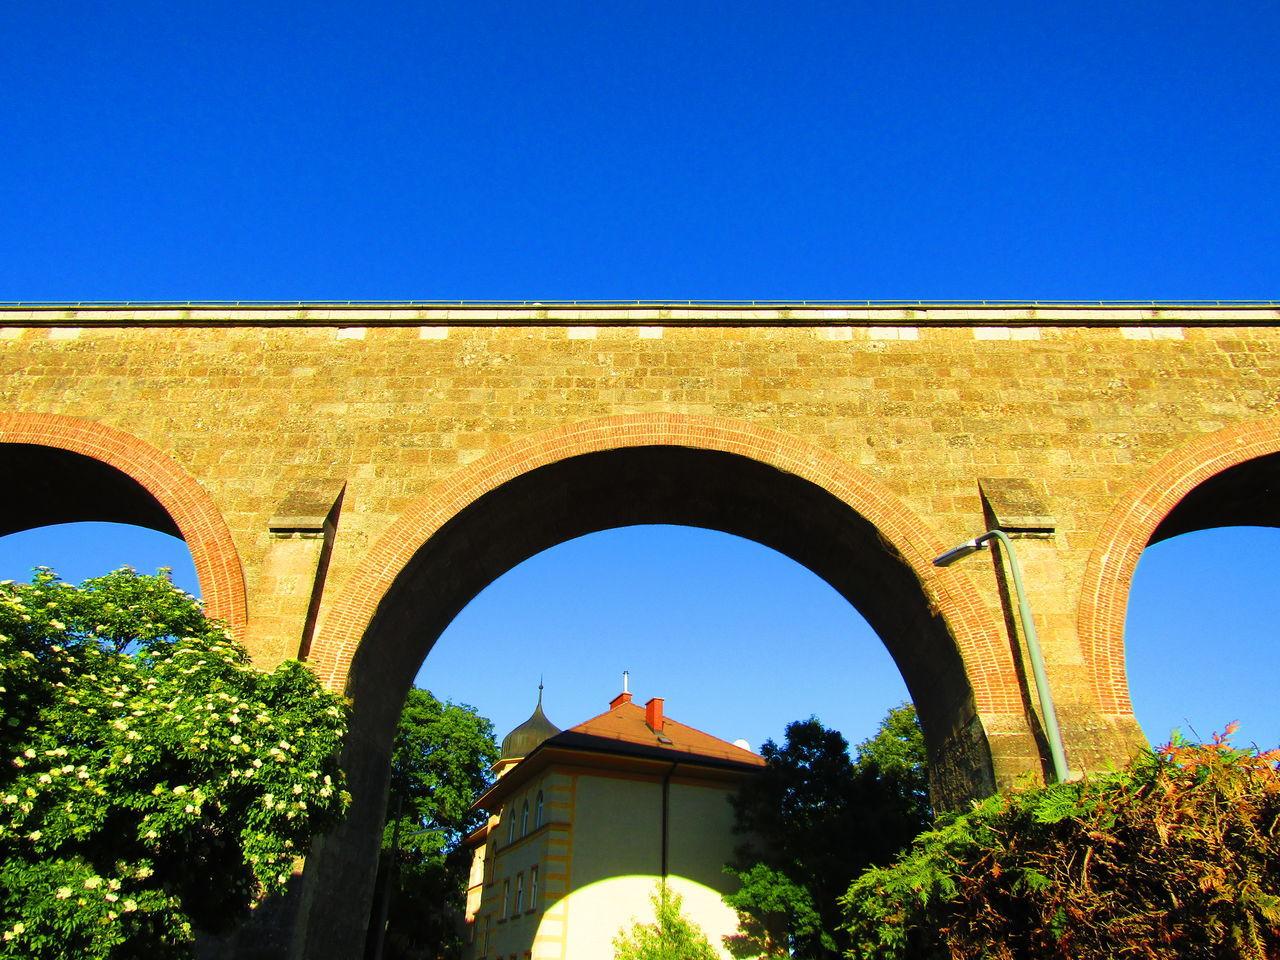 Viadukt Aquaduct Aquädukt Wien Vienna Austria Liesing Viaduct Clear Sky Low Angle View Outdoors Sunny Built Structure Architecture Arch